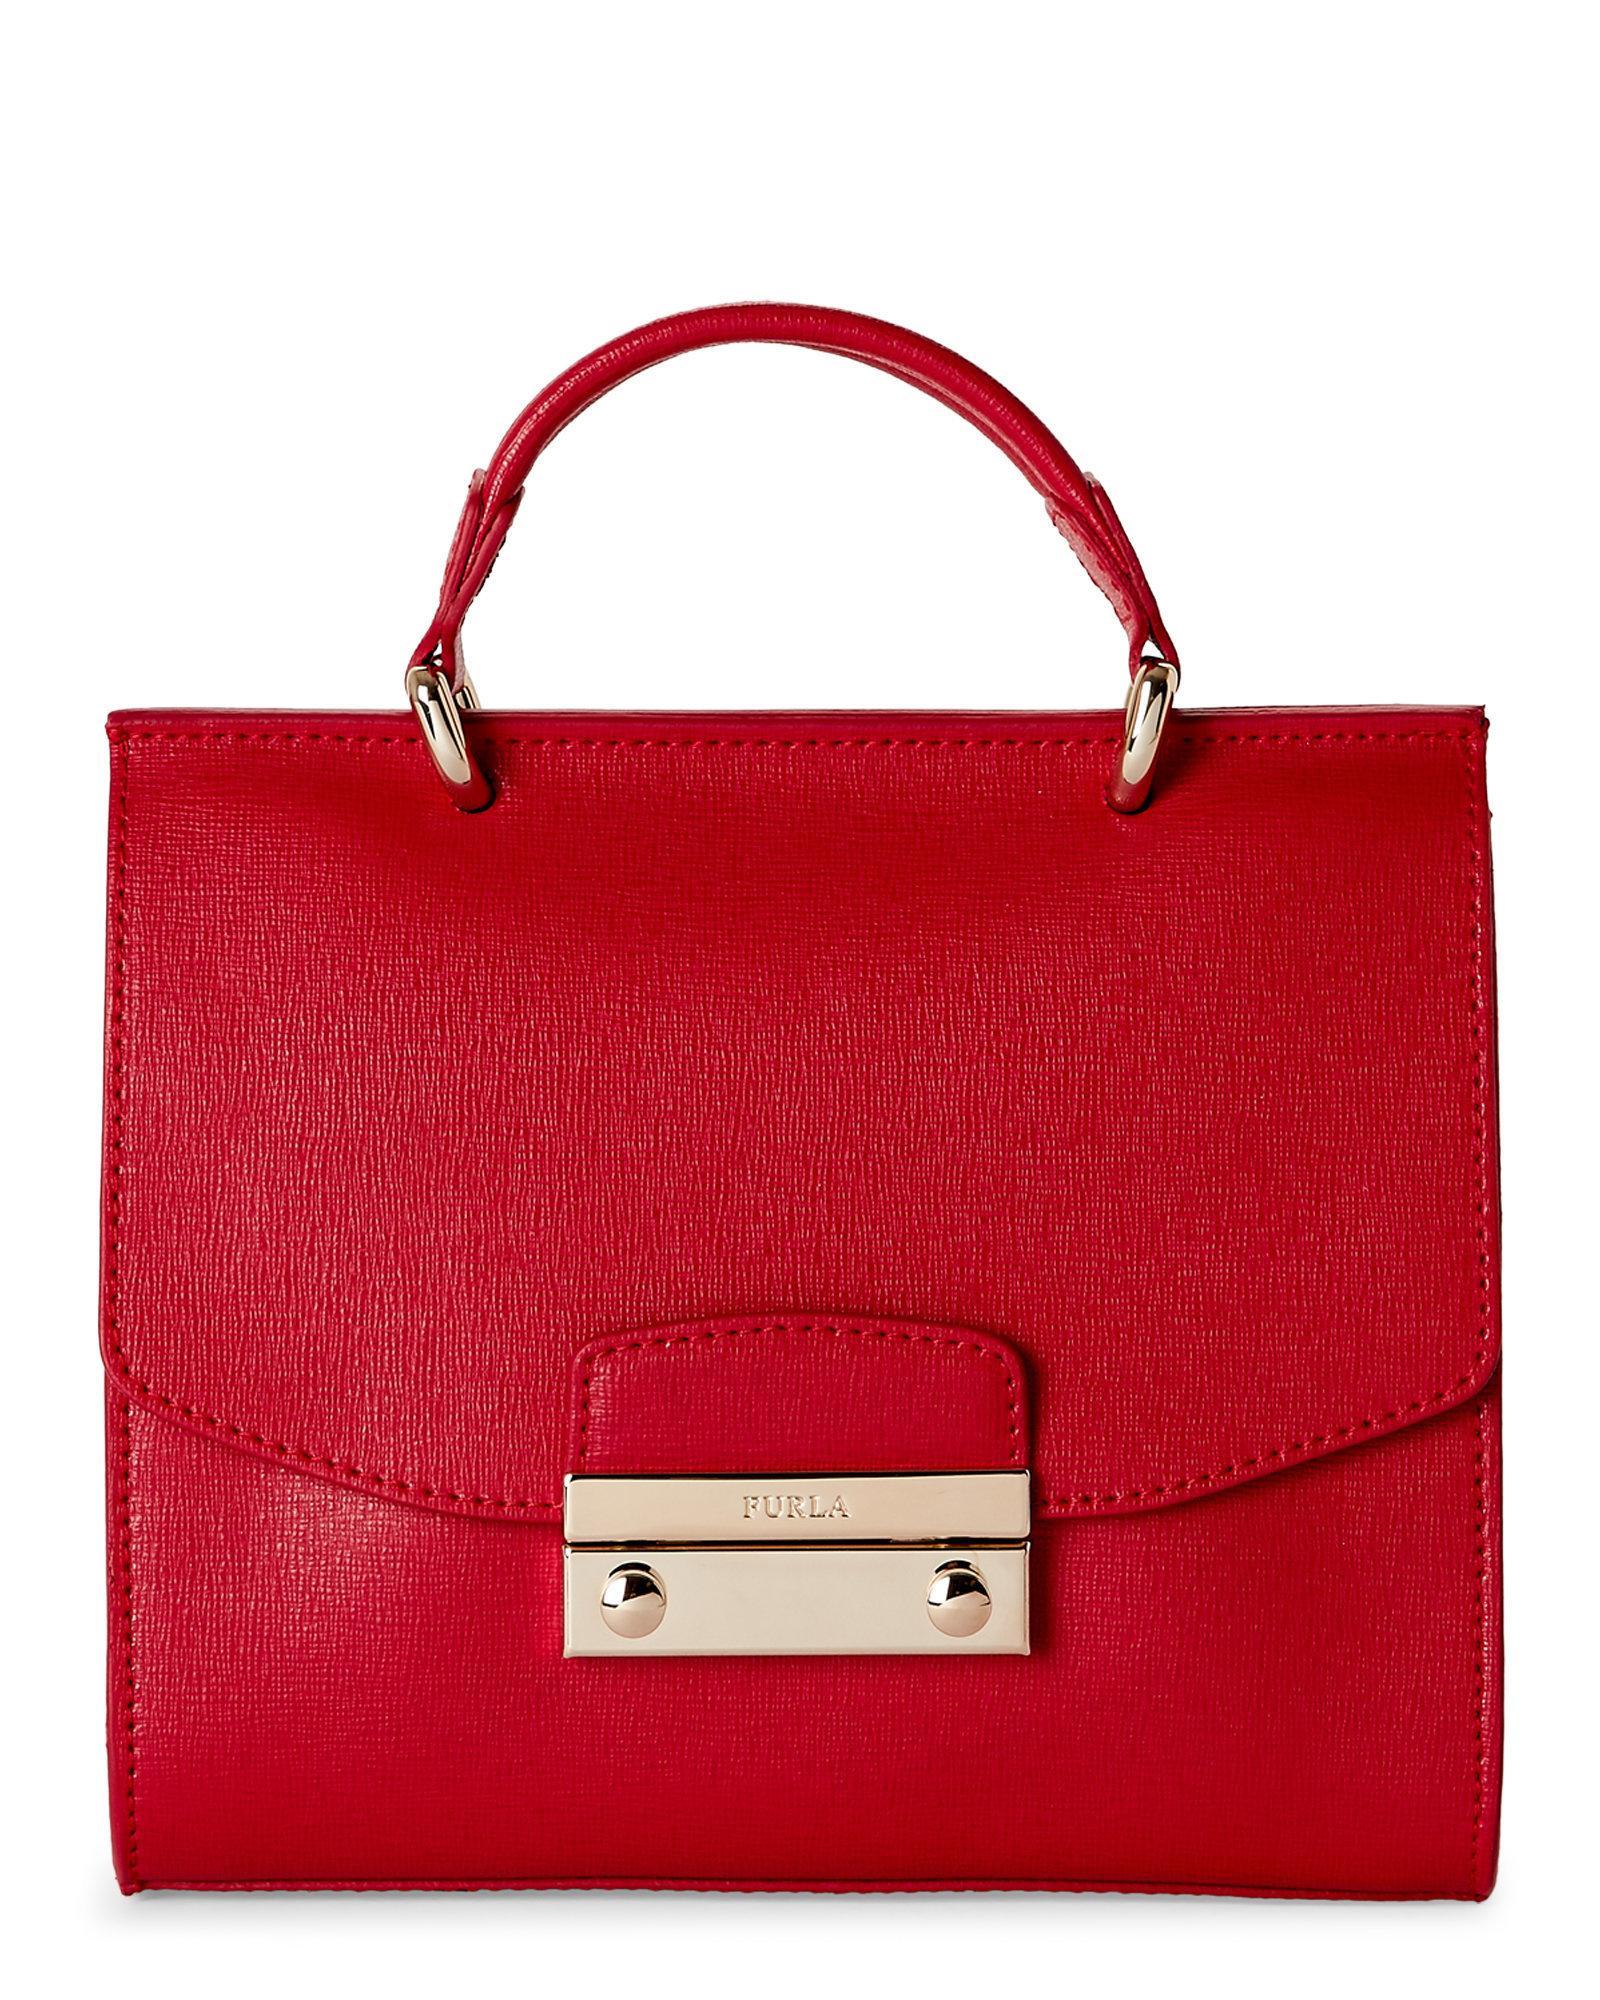 Furla Ruby Julia Mini Top Handle Satchel in Red